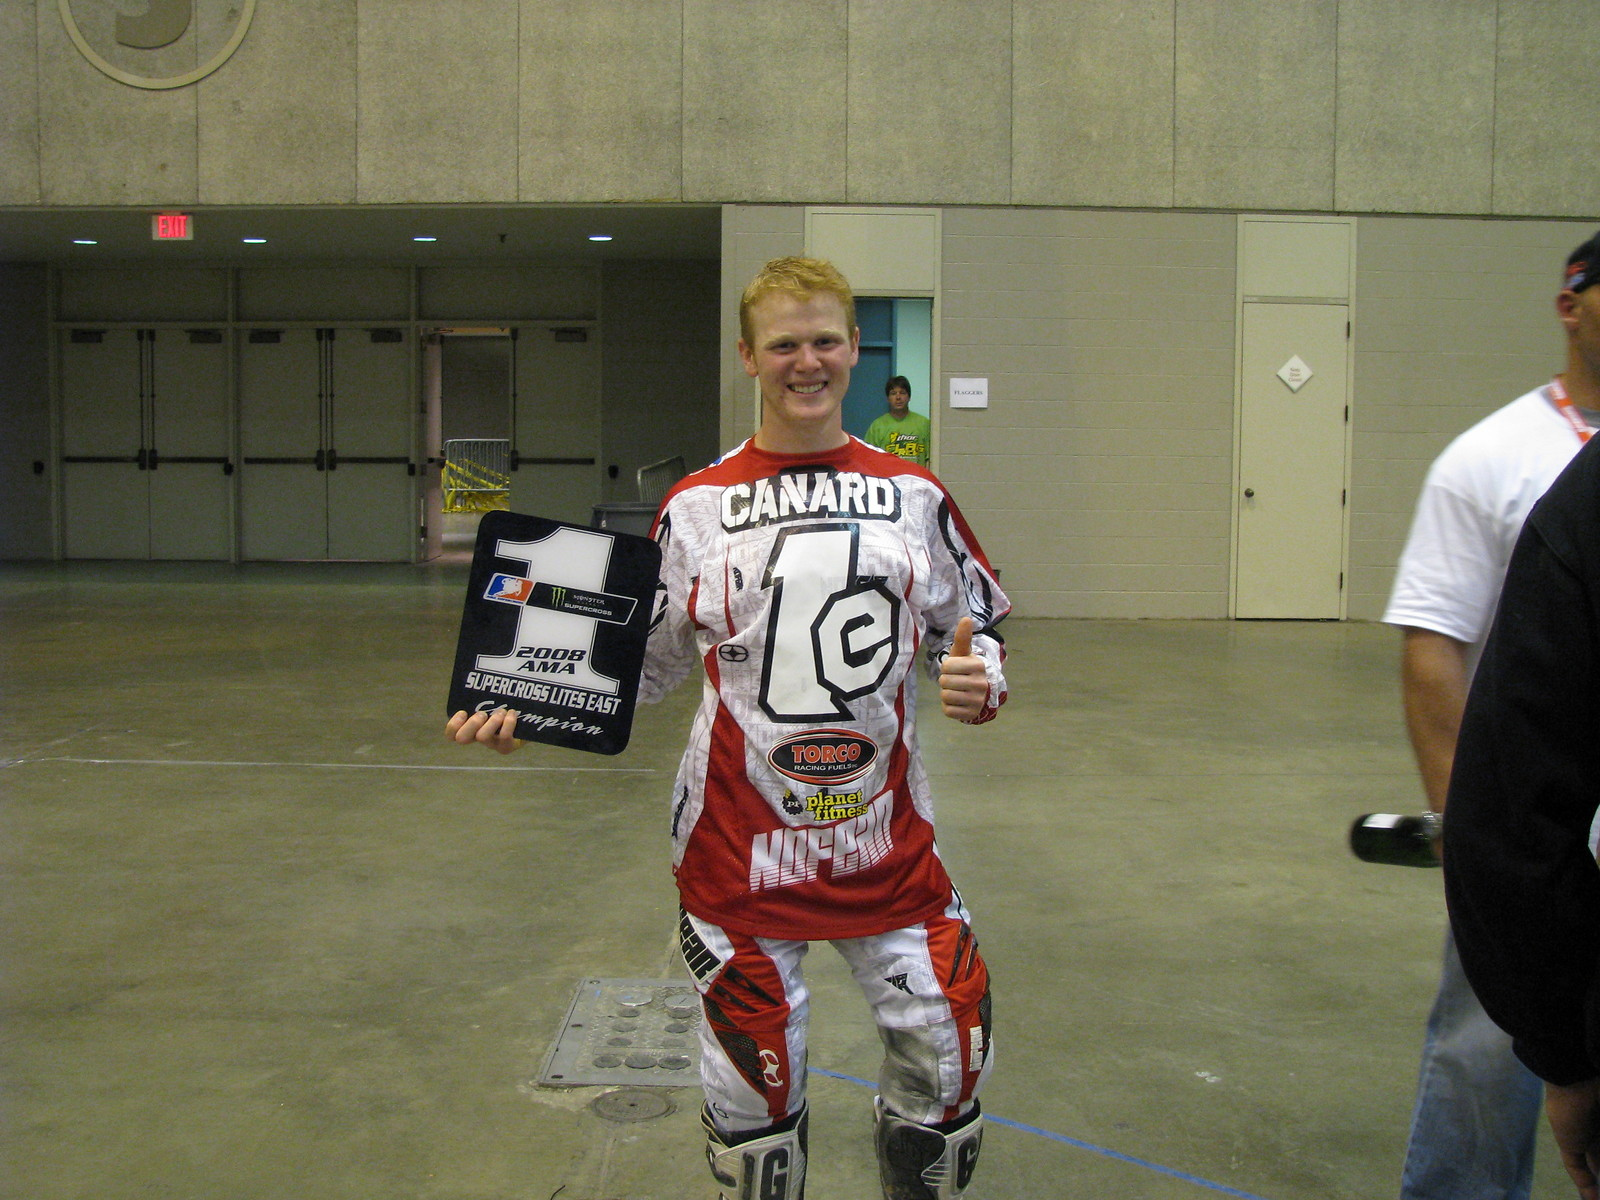 Canard #1 - RRsis17 - Motocross Pictures - Vital MX